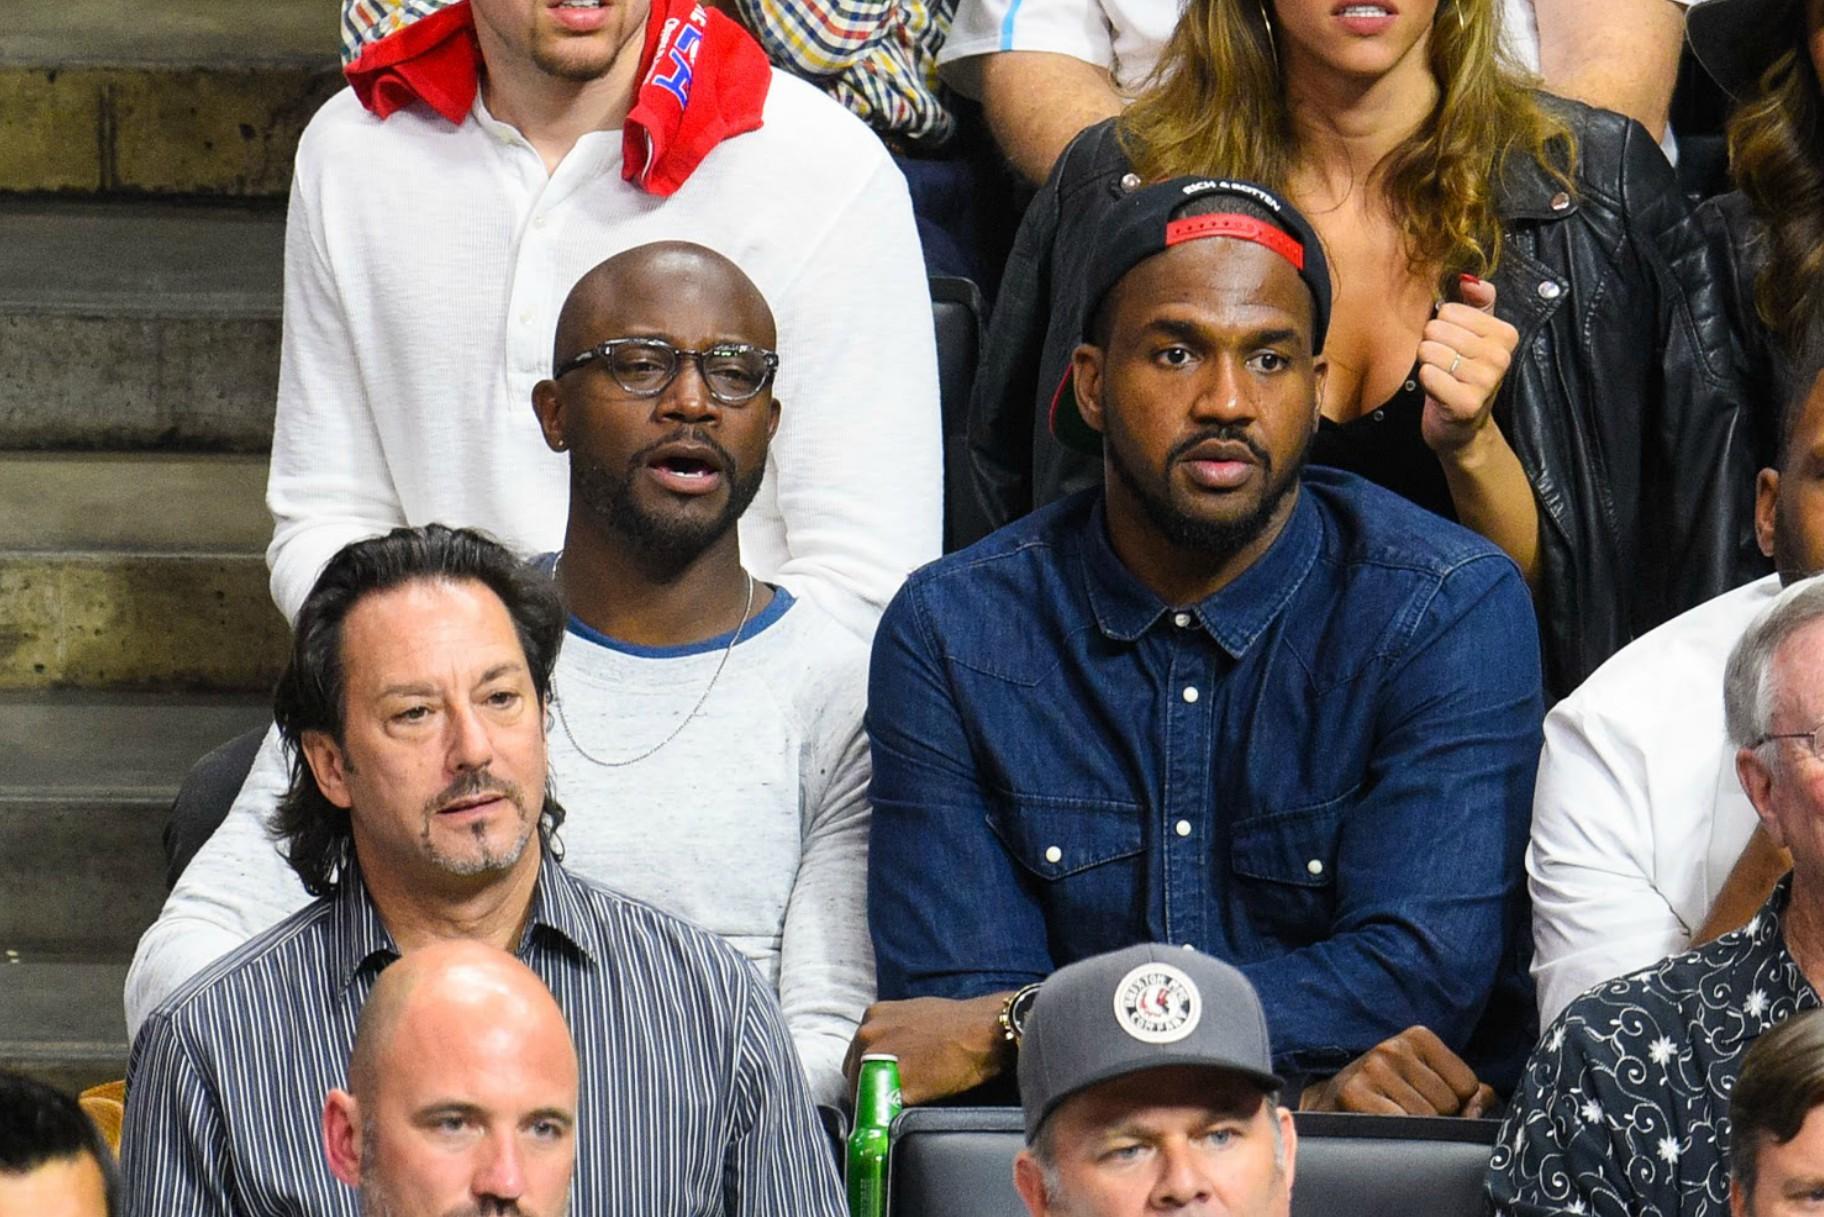 5 fapte despre Van Lathan și momentul său viral Kanye West